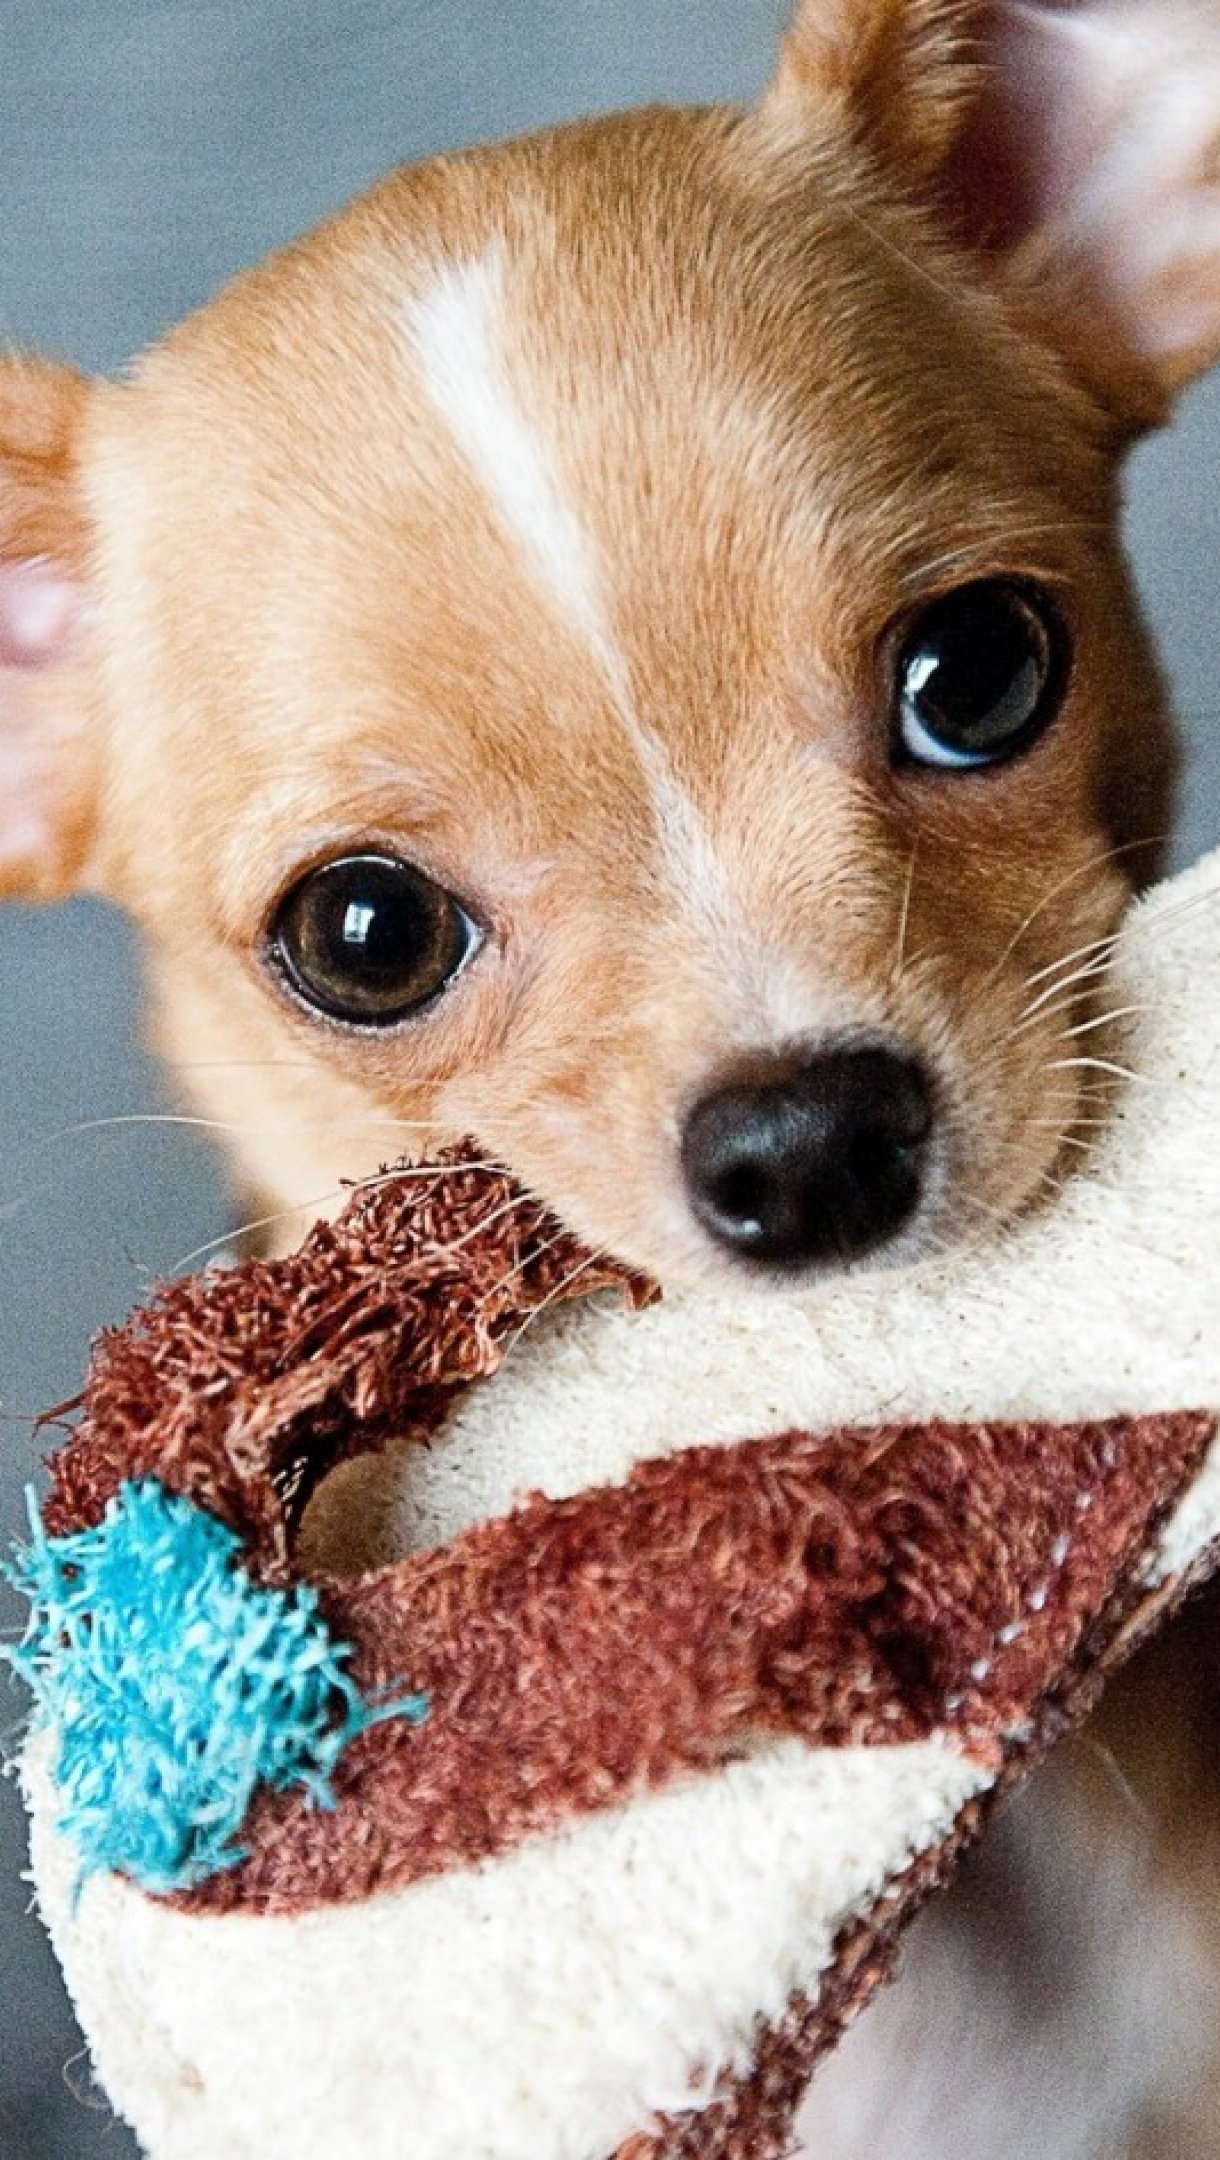 Fondos de pantalla Cachorro Chihuahua Vertical